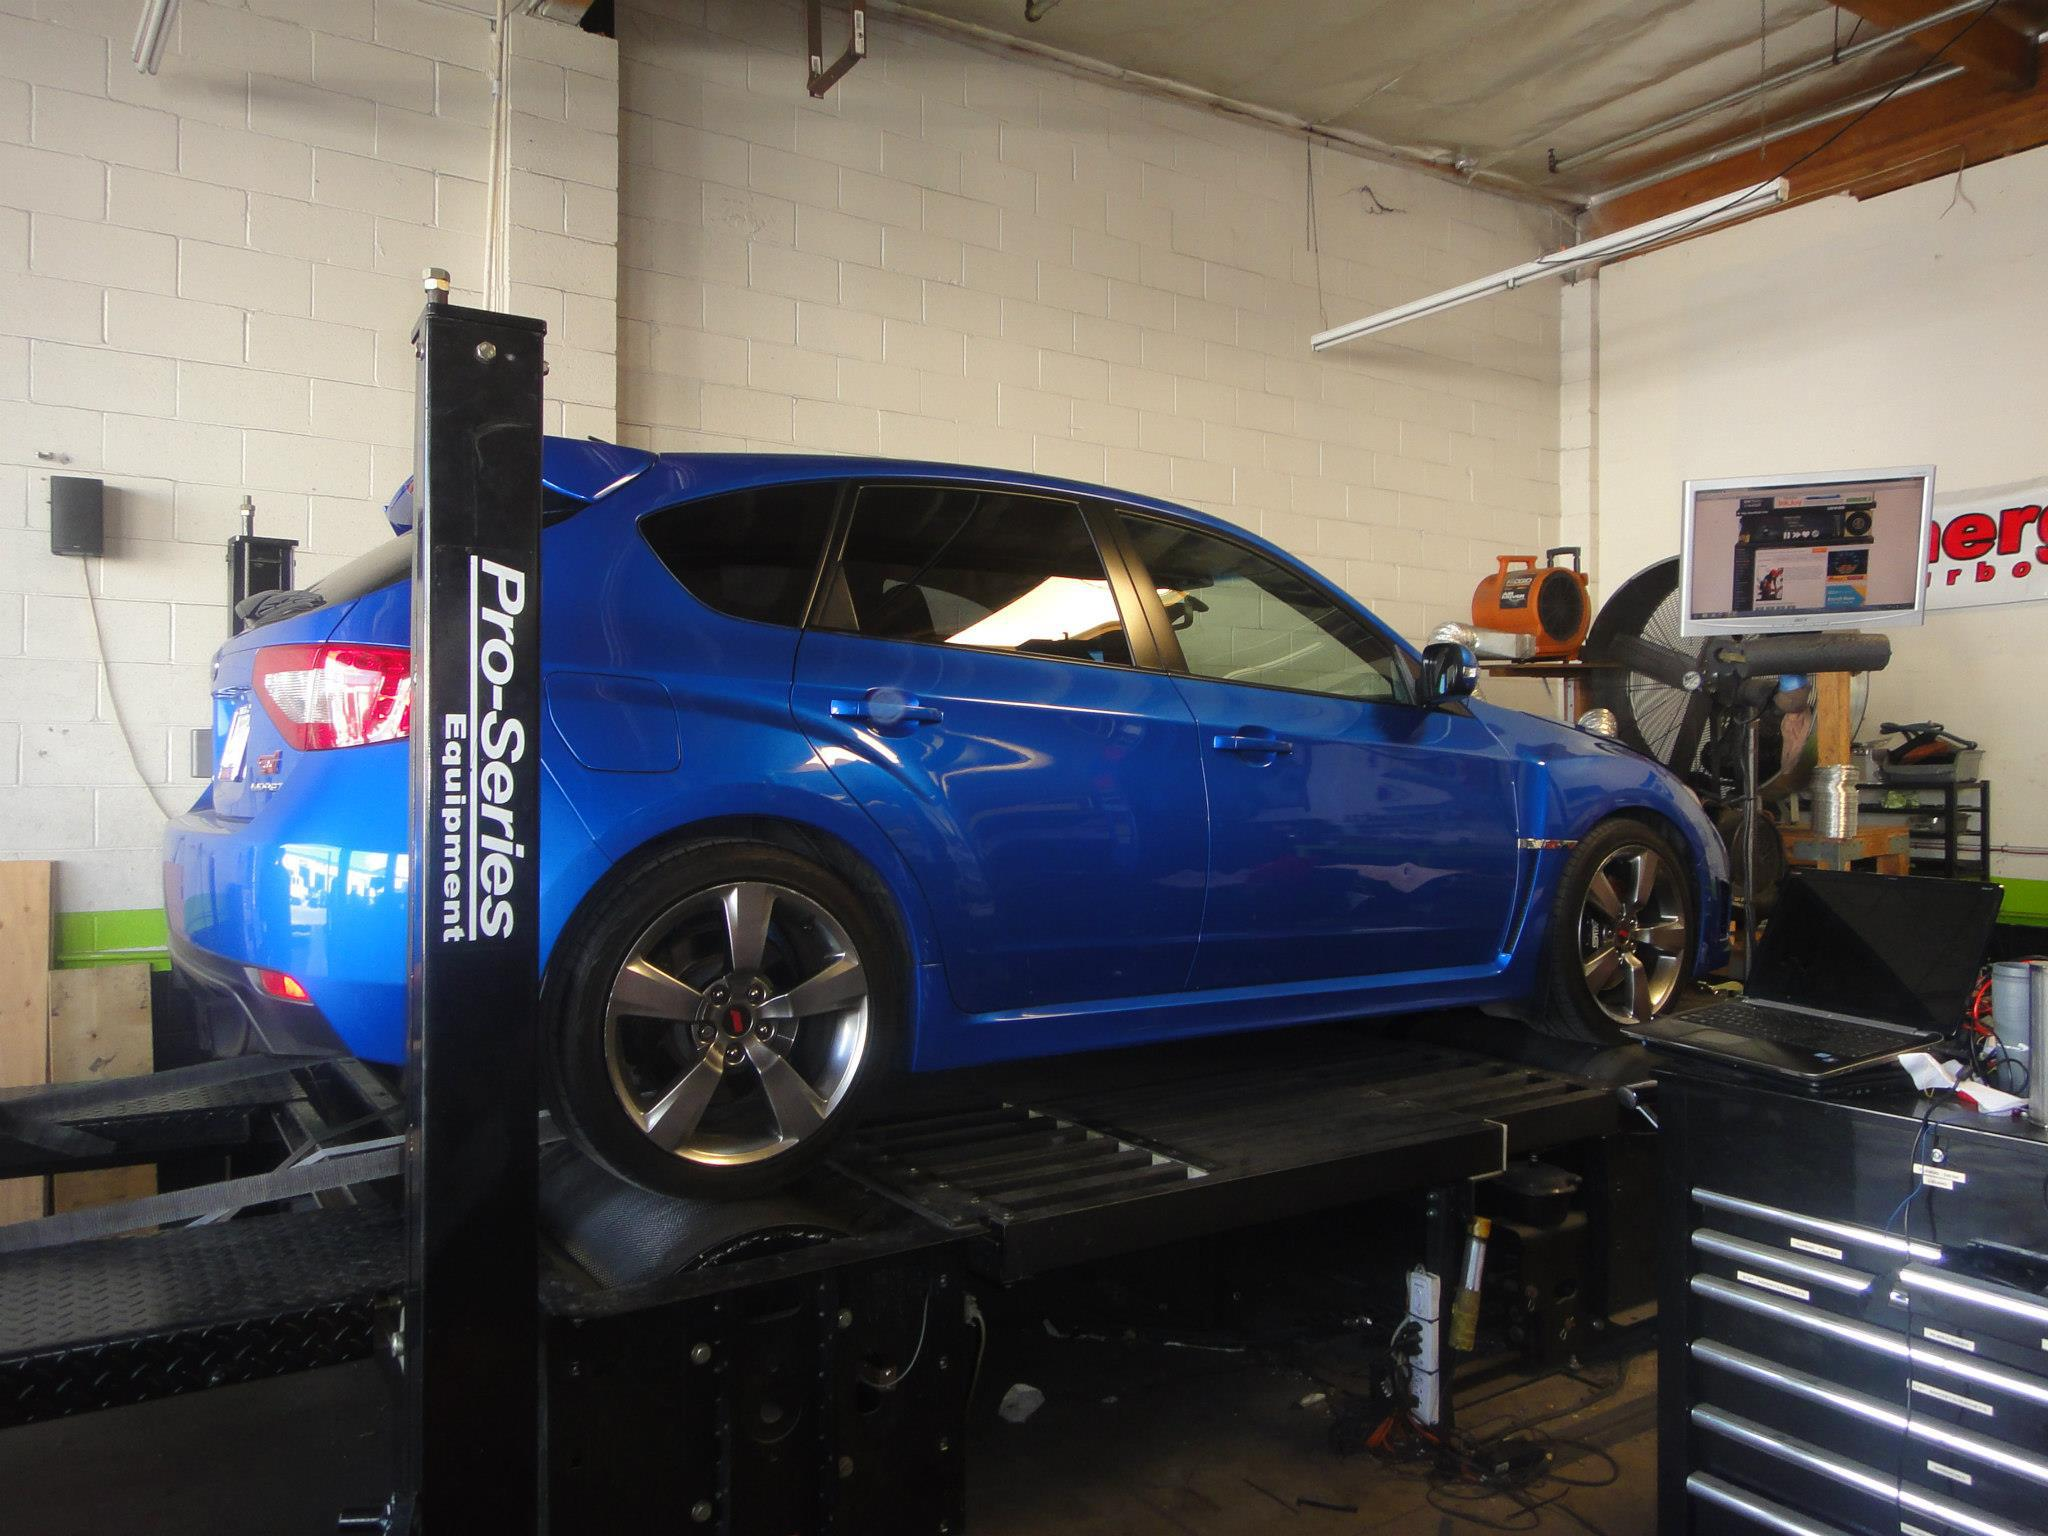 2008 Subaru STi - Garage queen - 16k-1-jpg